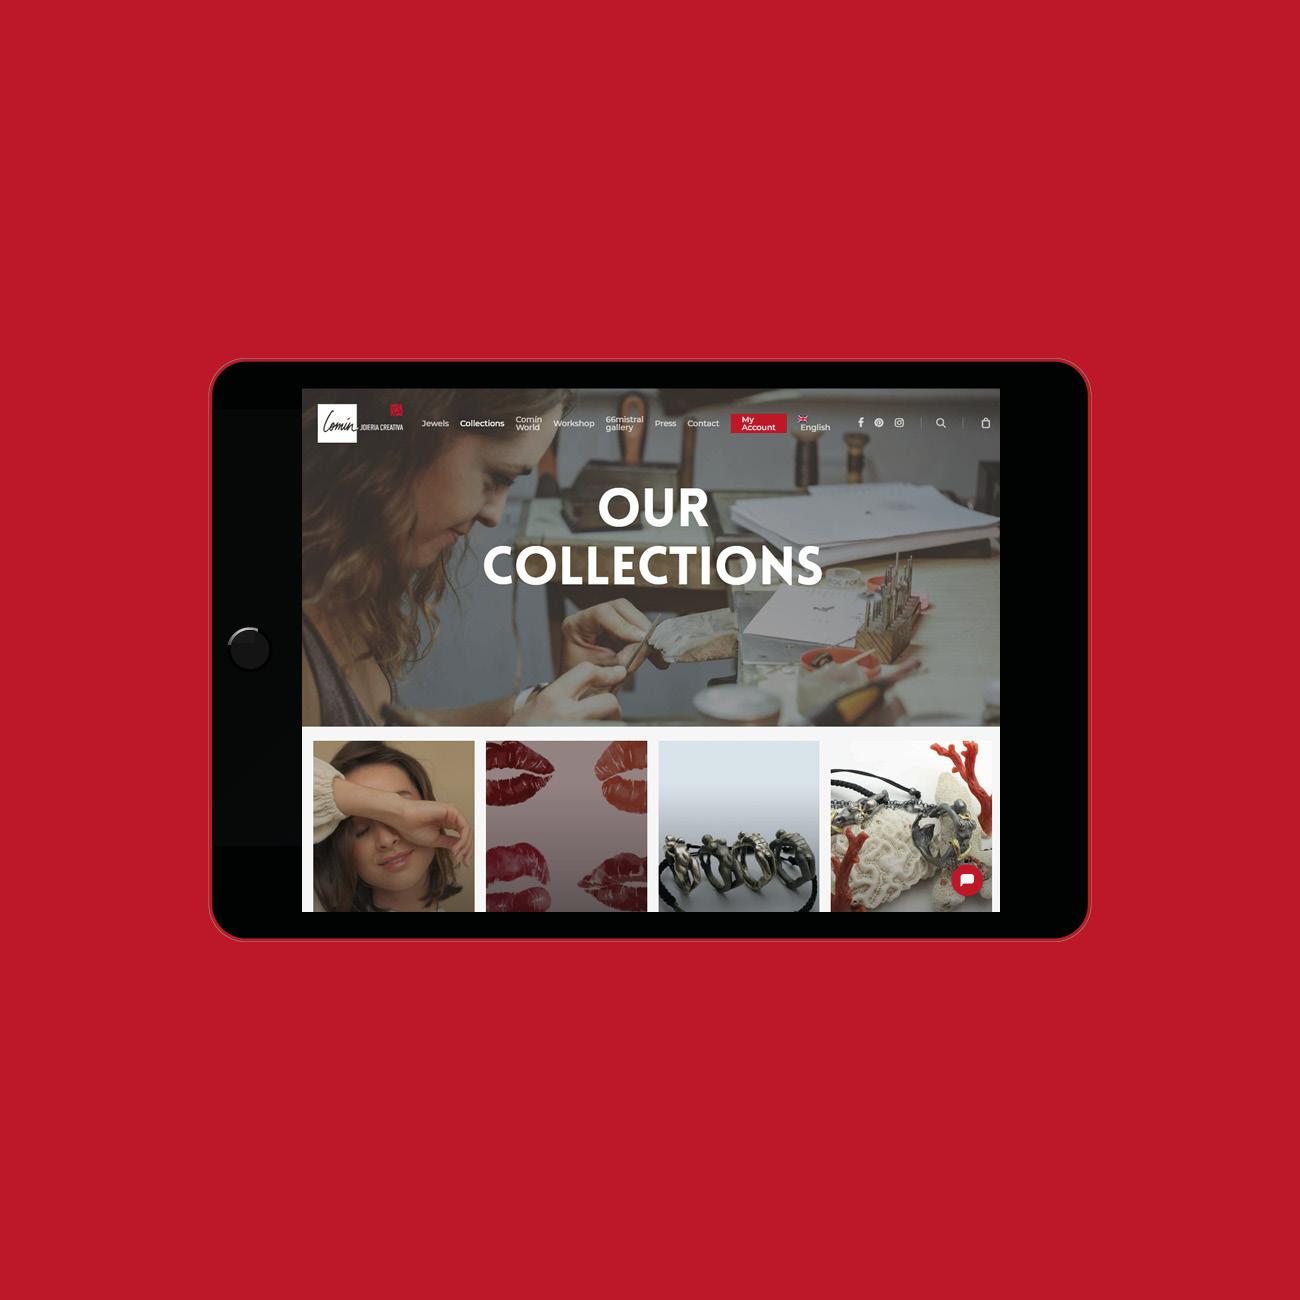 Miko Digital Agence web à Liège - Création site web Comín Joieria Creativa